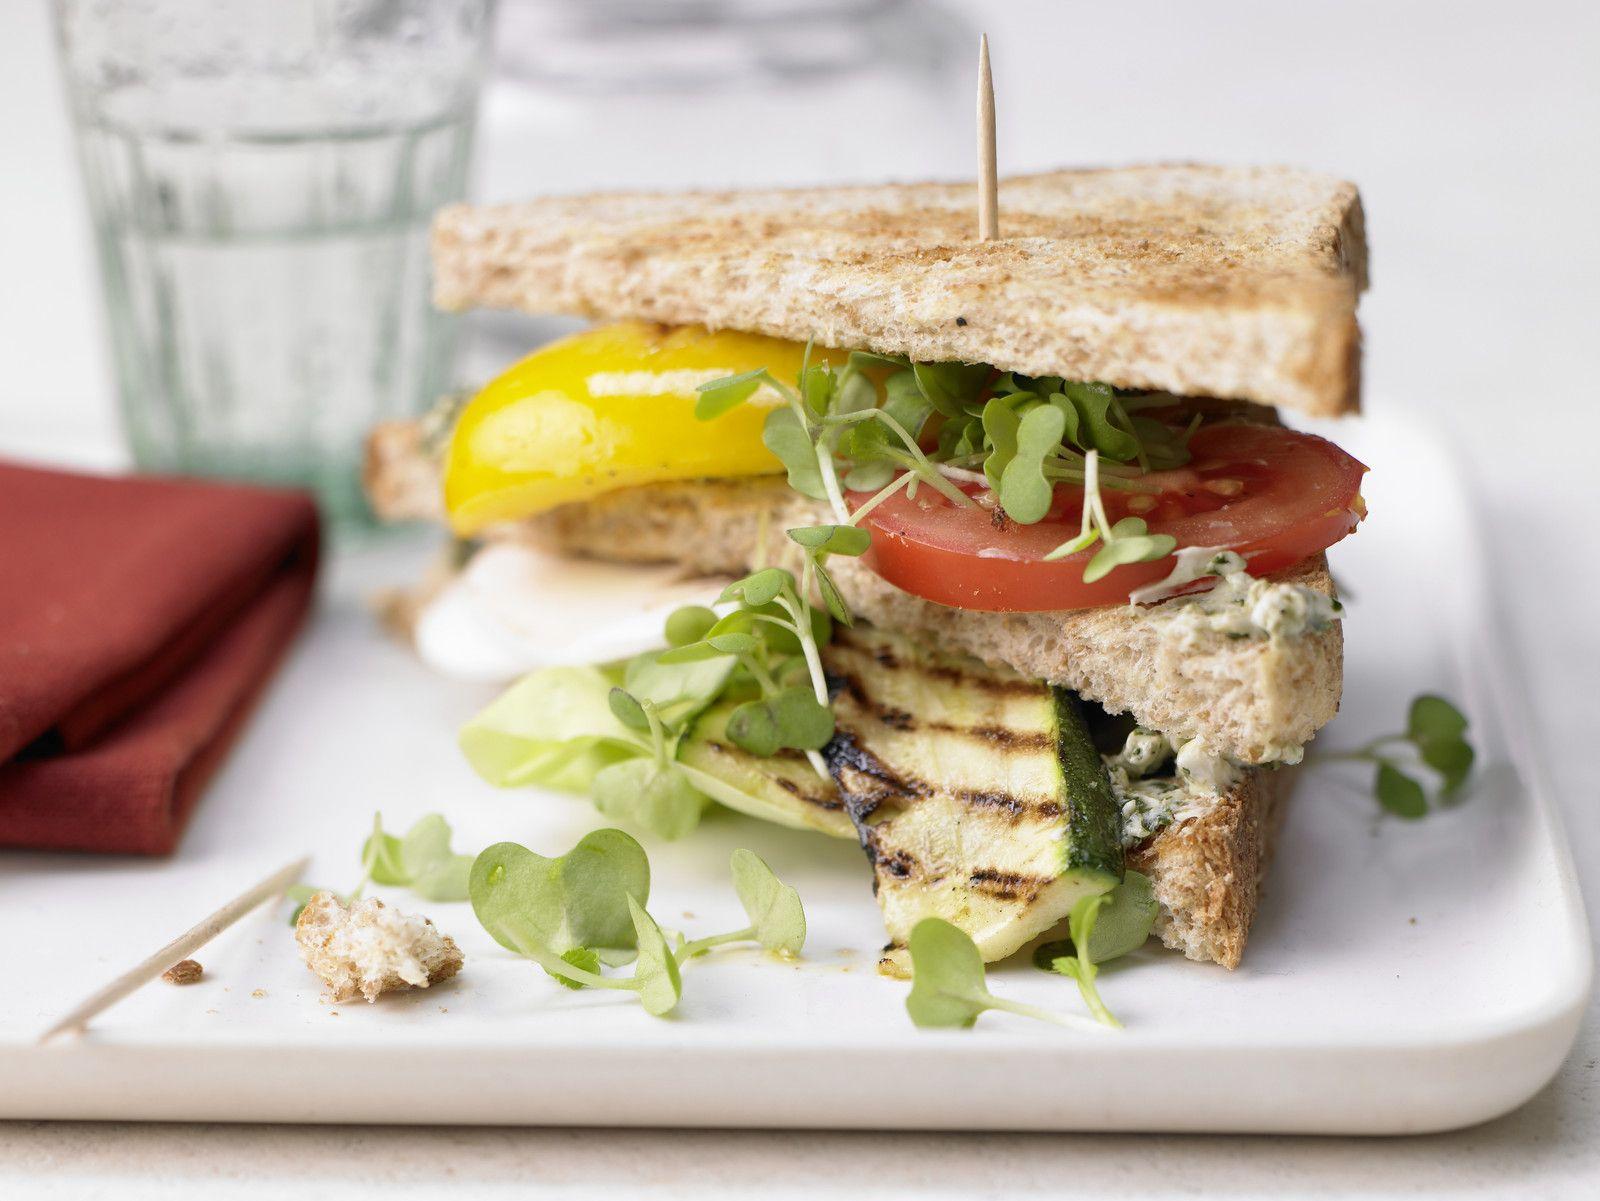 Kochbuch: Sandwich | EAT SMARTER